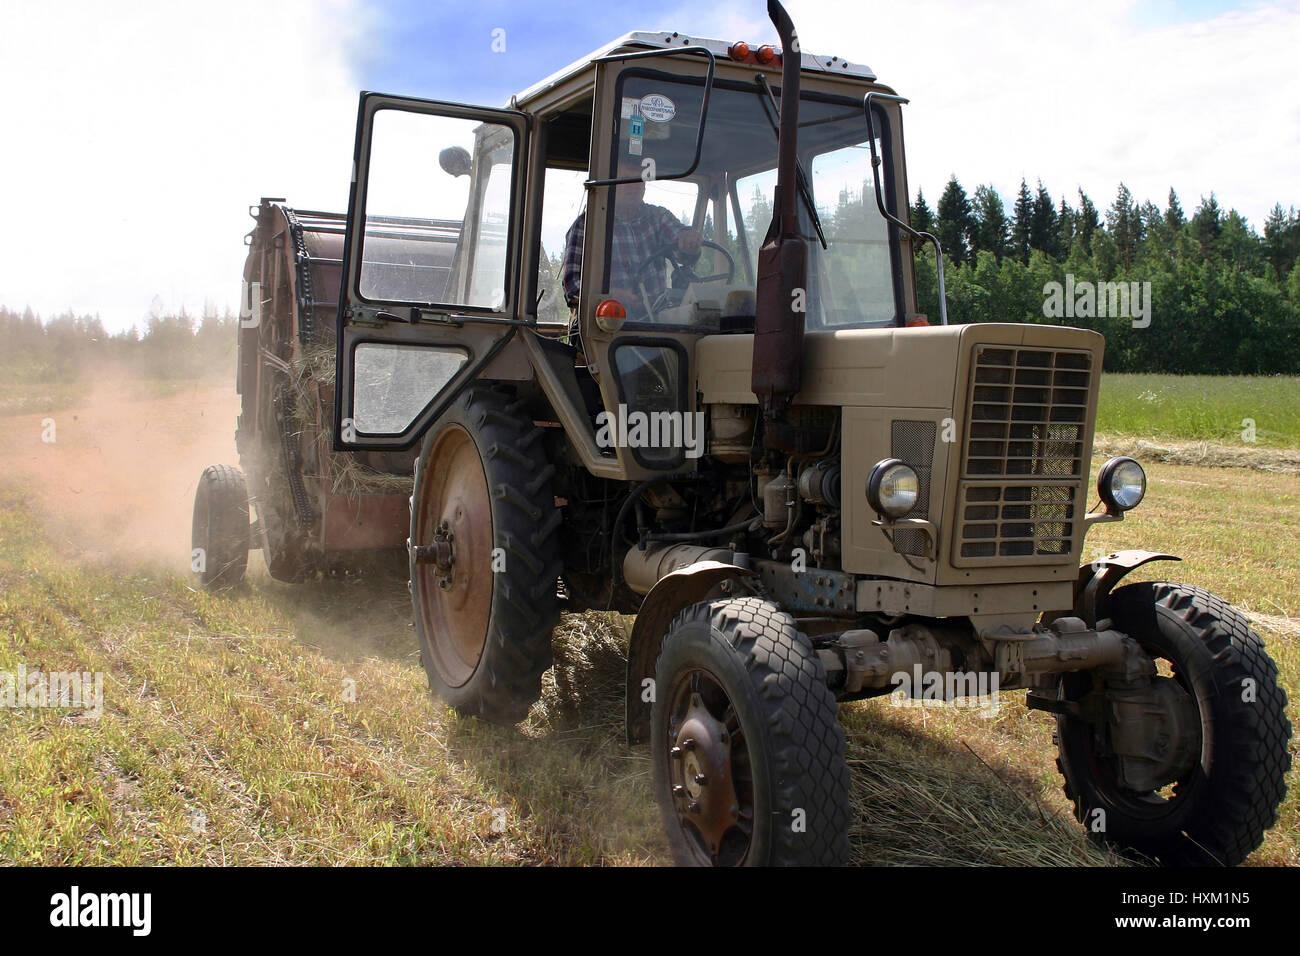 Russian Tractor Stockfotos & Russian Tractor Bilder - Seite 3 - Alamy